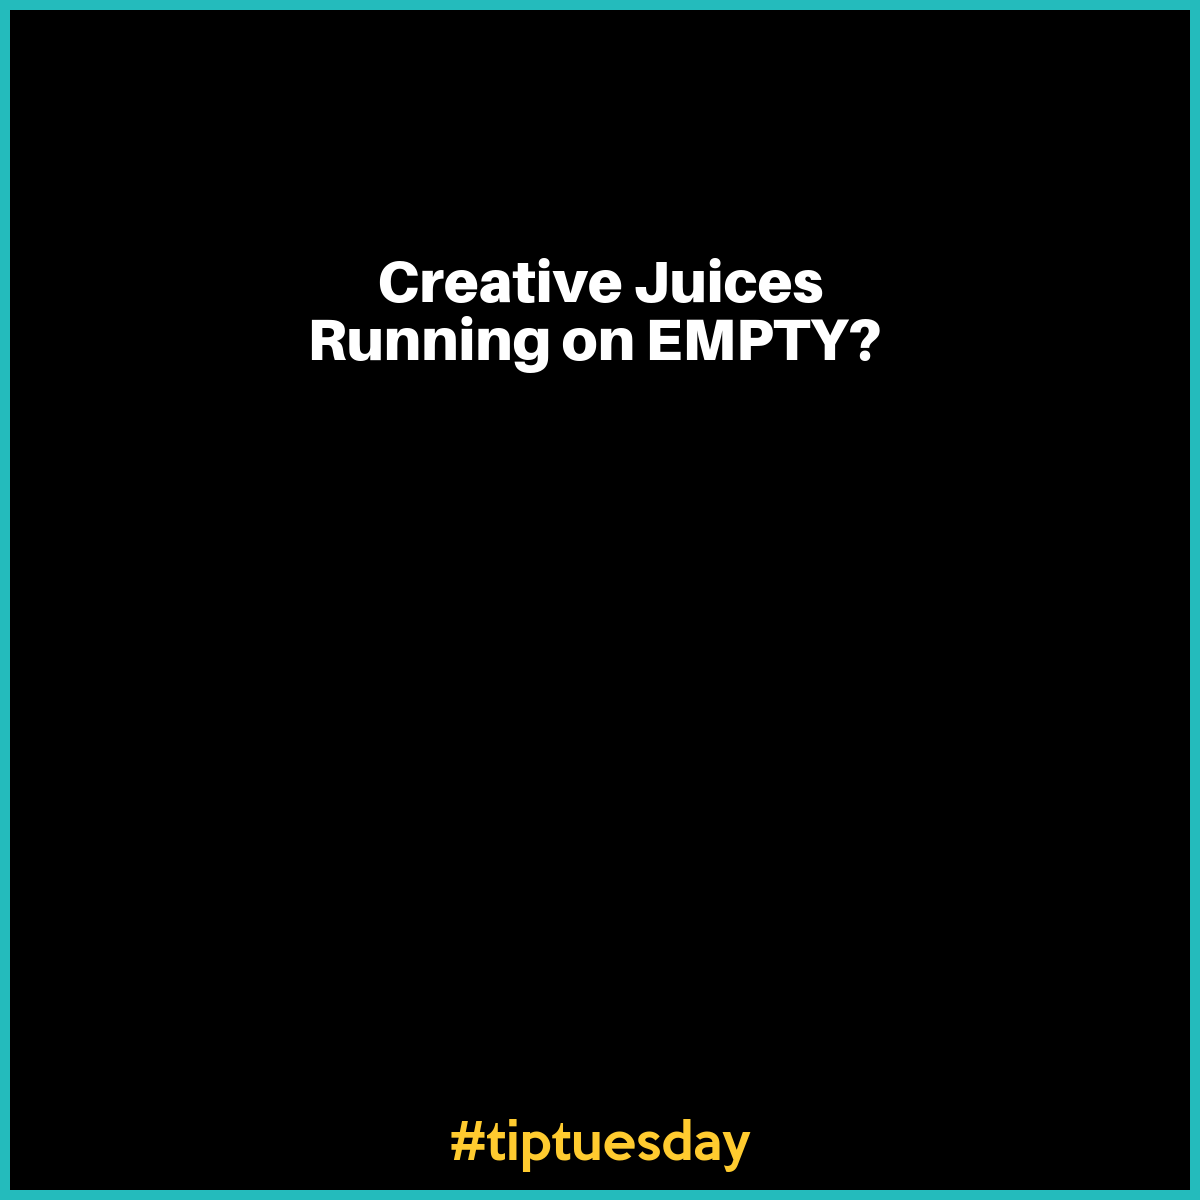 Creative Juices Running on Empty?